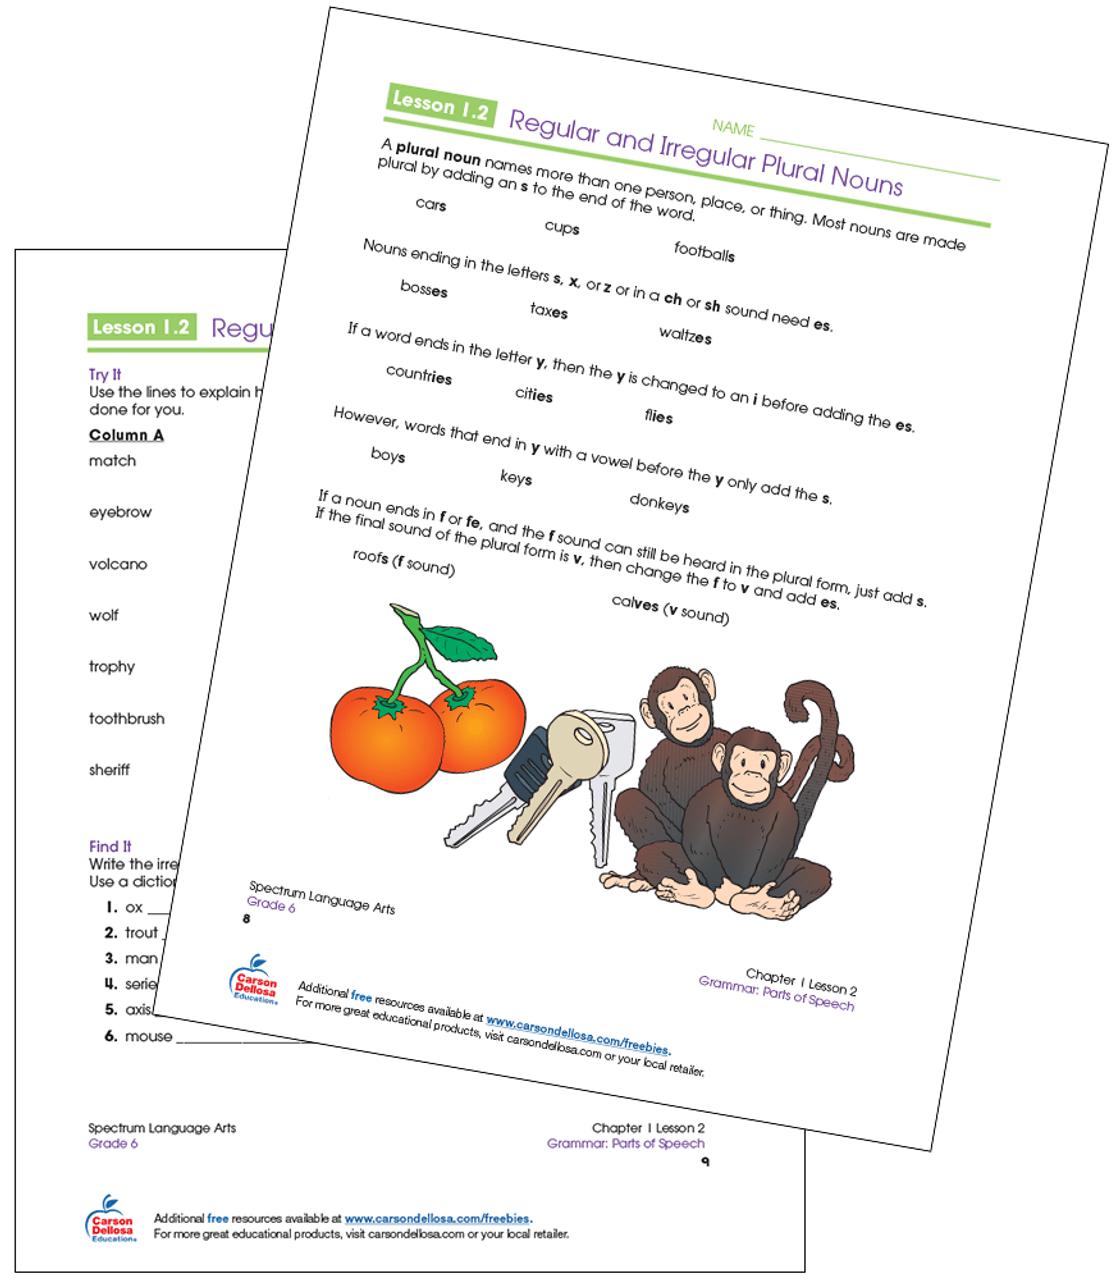 Regular and Irregular Plural Nouns Grade 6 Free Printable   Carson Dellosa [ 1280 x 1120 Pixel ]